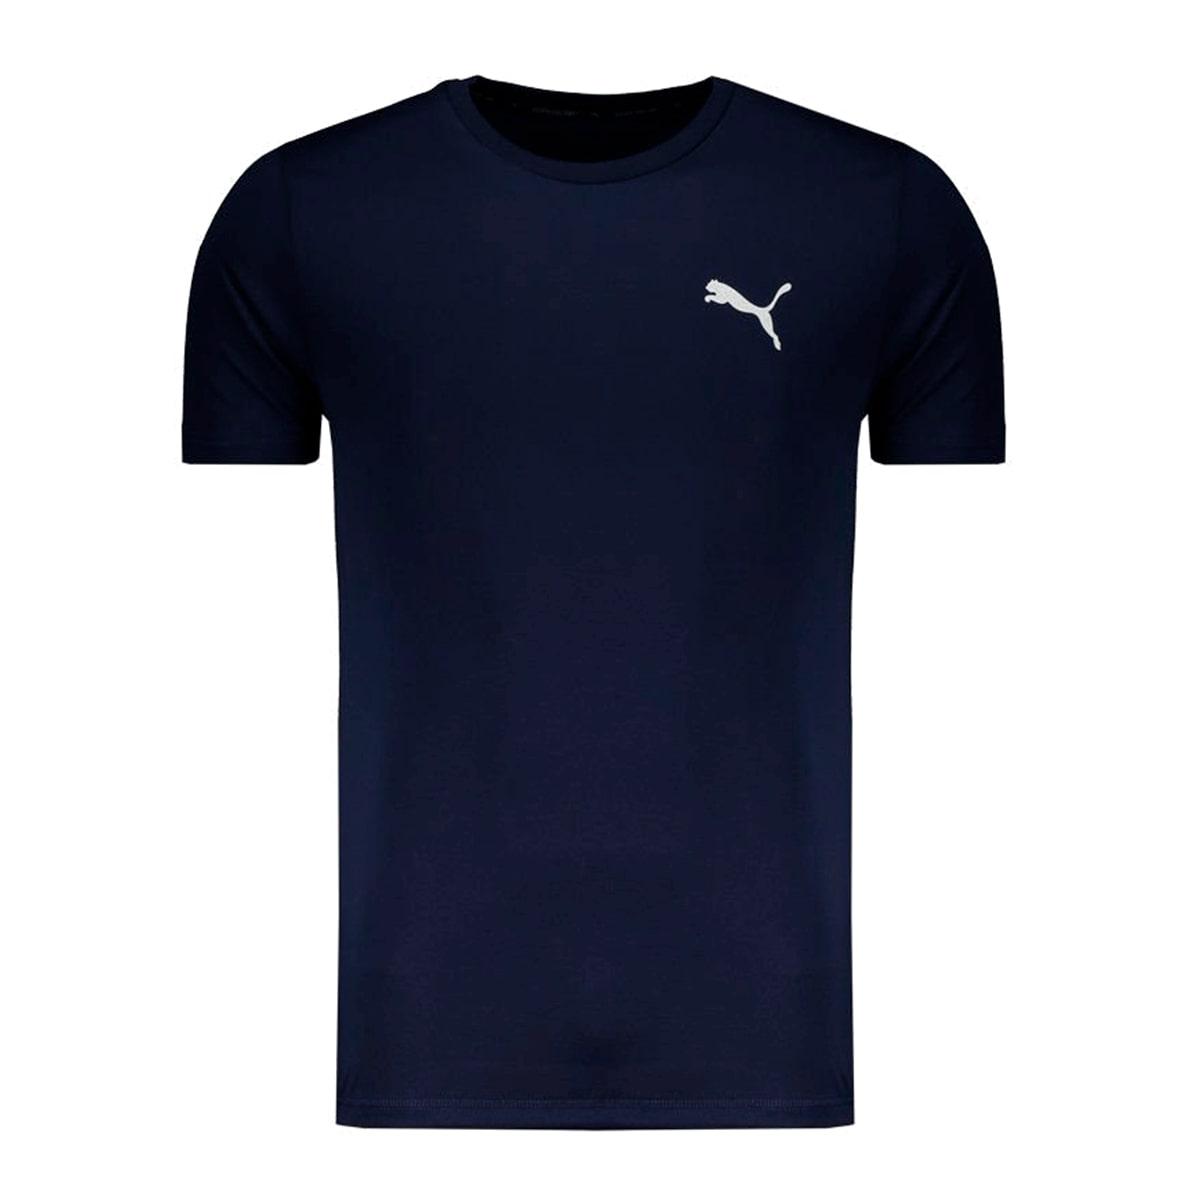 Camiseta Puma Active Tee Logo Masculino Marinho